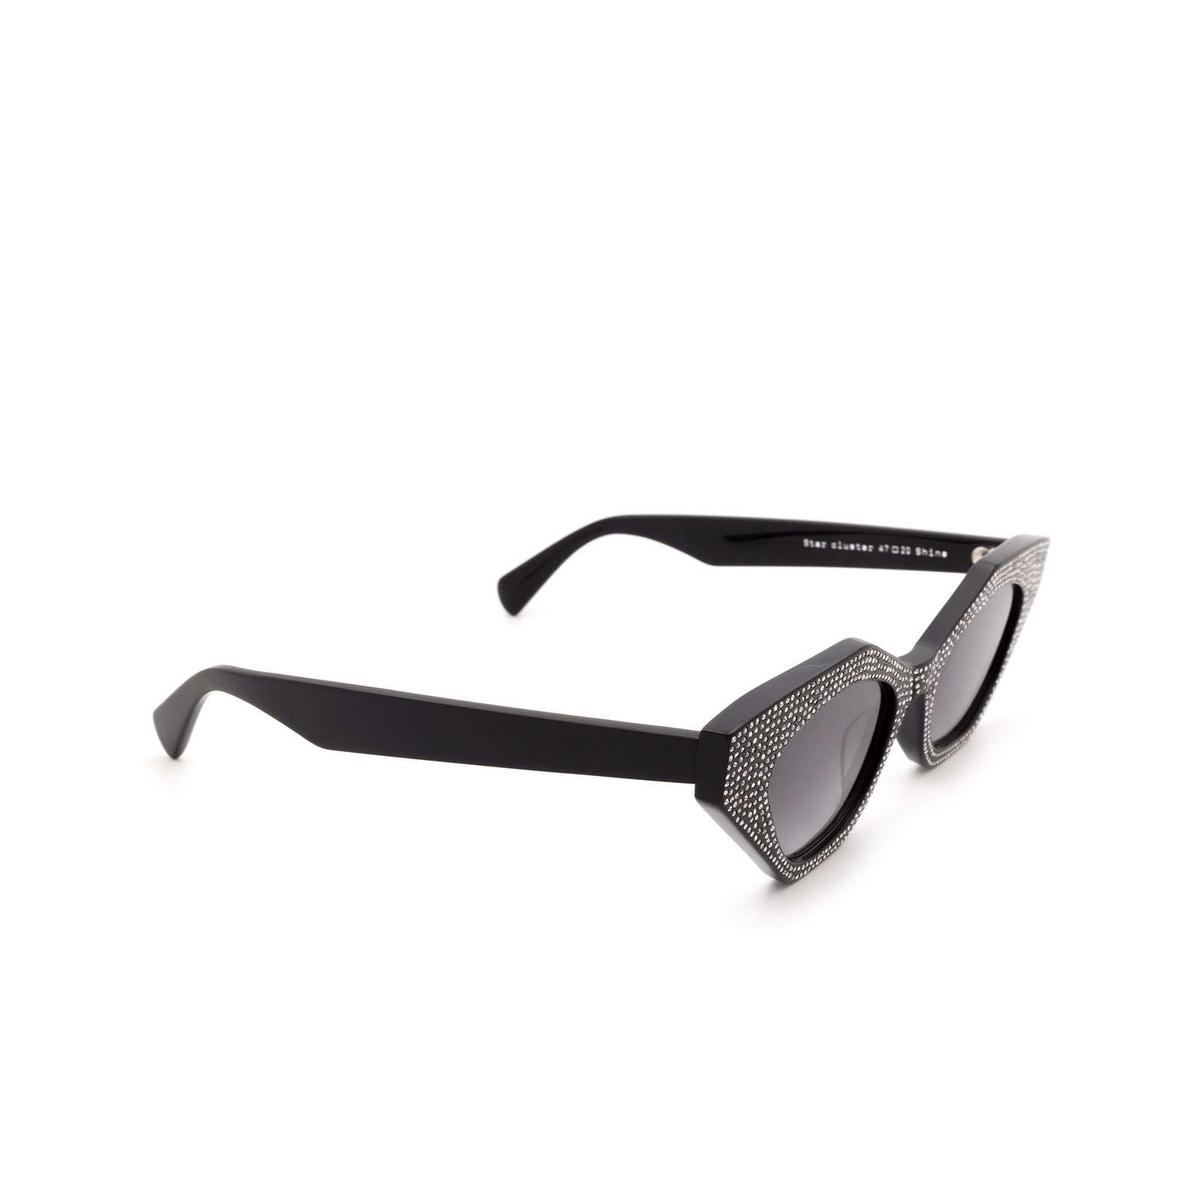 Chimi® Cat-eye Sunglasses: Star Cluster color Black Shine - three-quarters view.